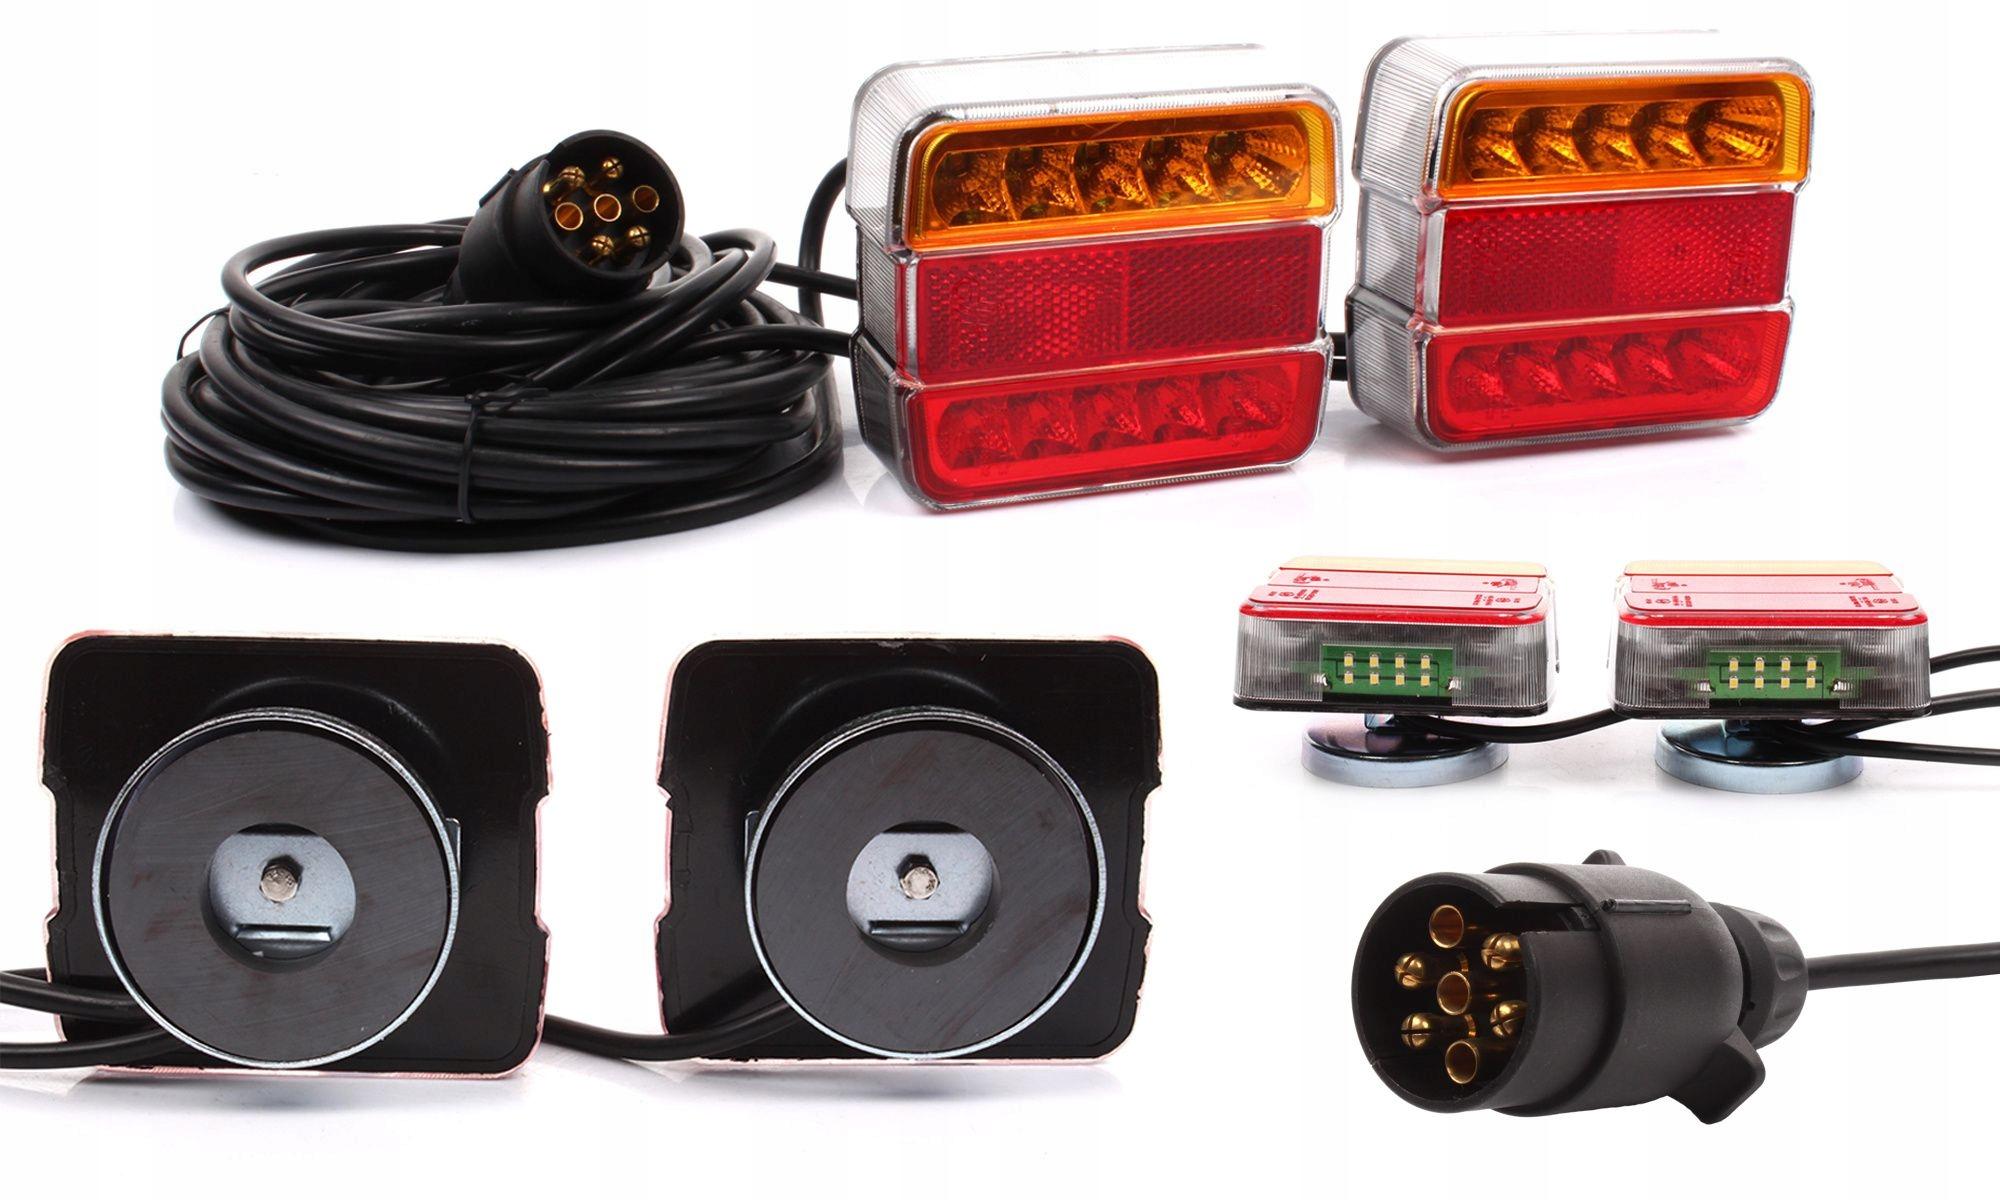 Набор ламповых фар для прицепа Led 12V с магнитом